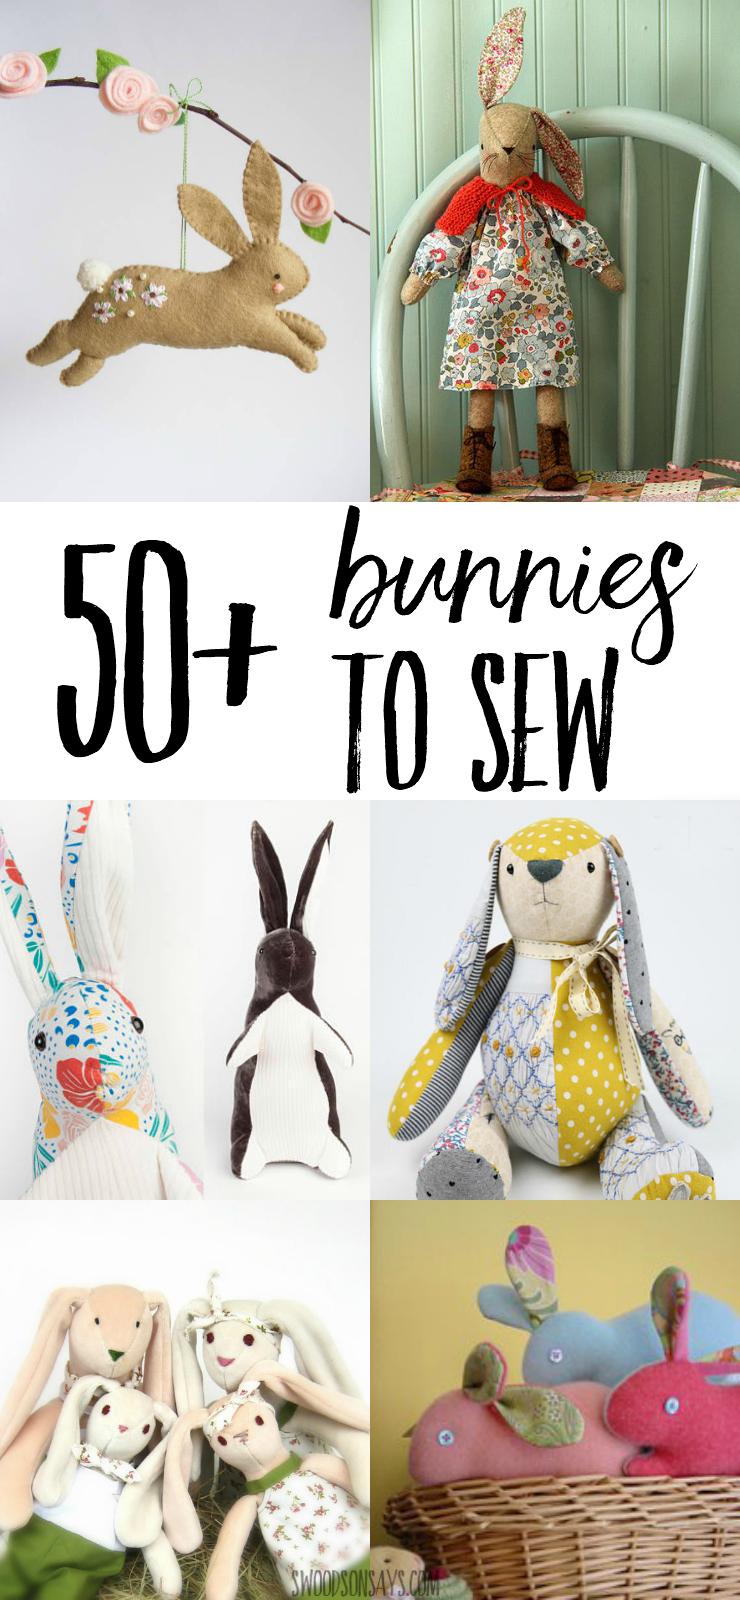 50 stuffed bunny sewing patterns swoodson says check out over 50 bunny sewing patterns to sew the sweetest stuffed animals perfect easter jeuxipadfo Images